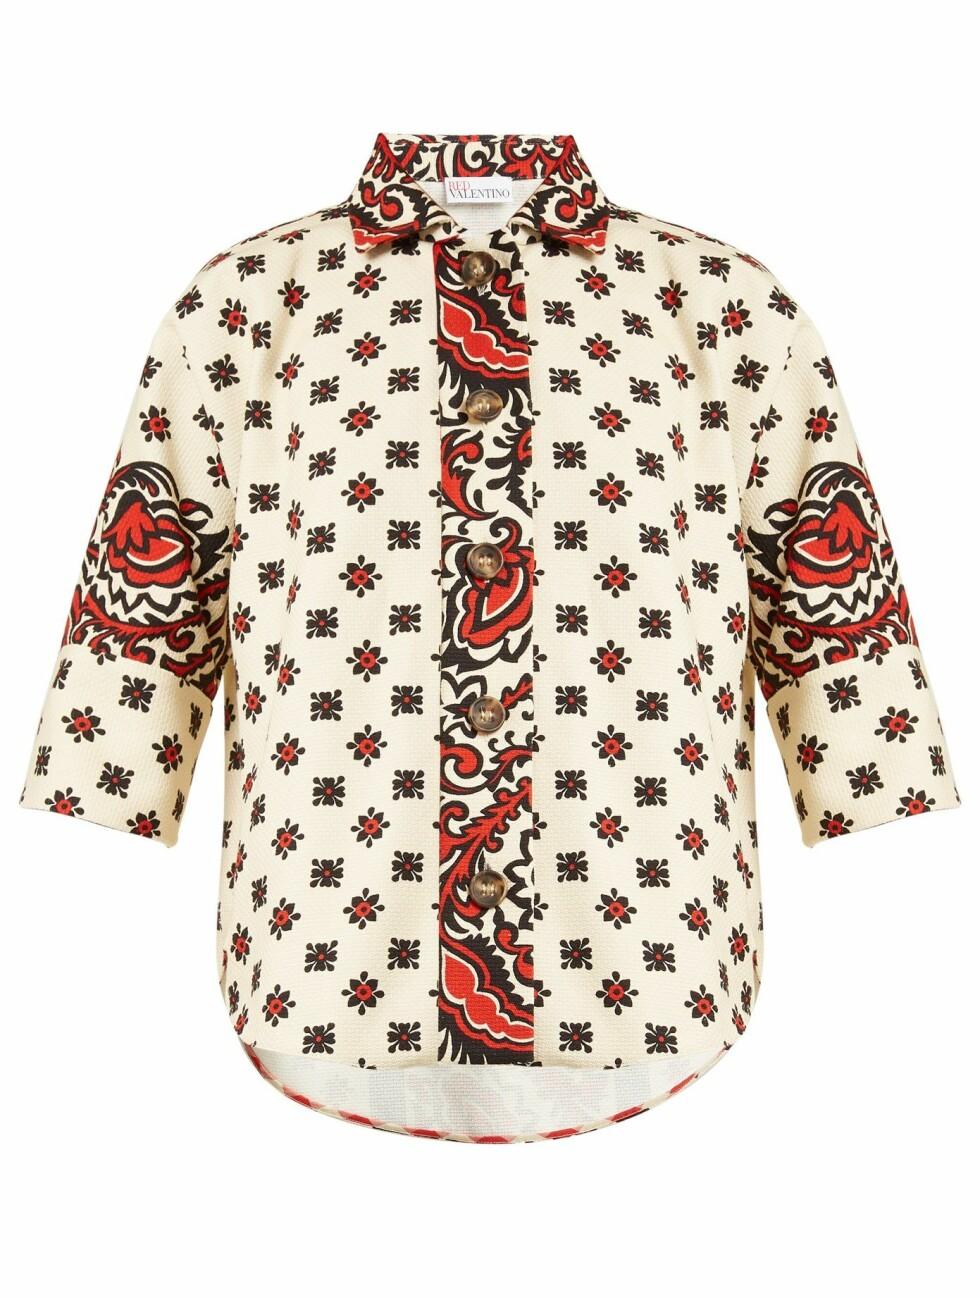 Skjorte fra REDValentino |1490,-| https://www.matchesfashion.com/intl/products/REDValentino-Paisley-floral-print-cotton-shirt-1205910